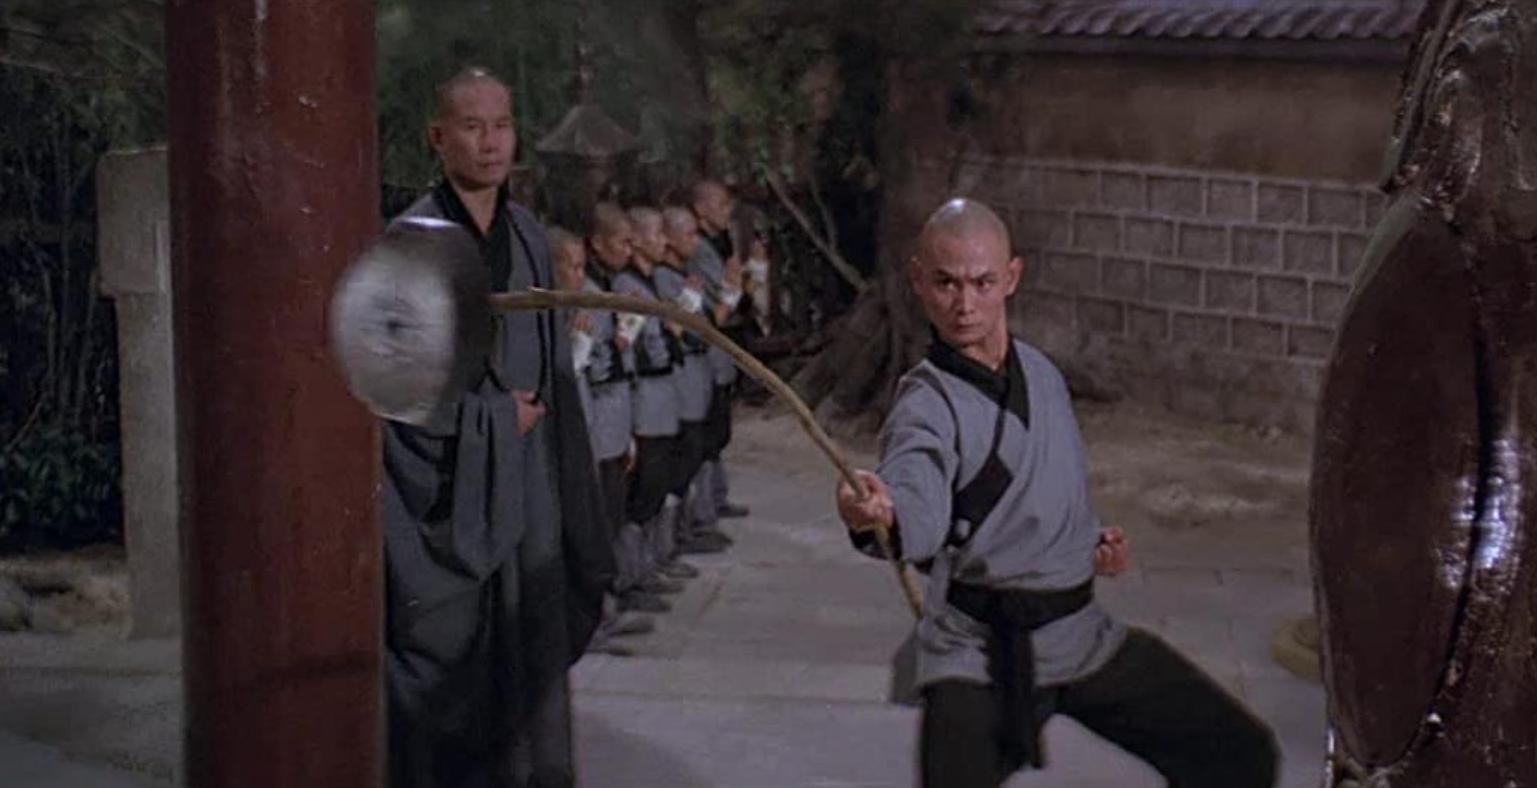 36 ступеней Шаолиня (1978) Shao Lin san shi liu fang